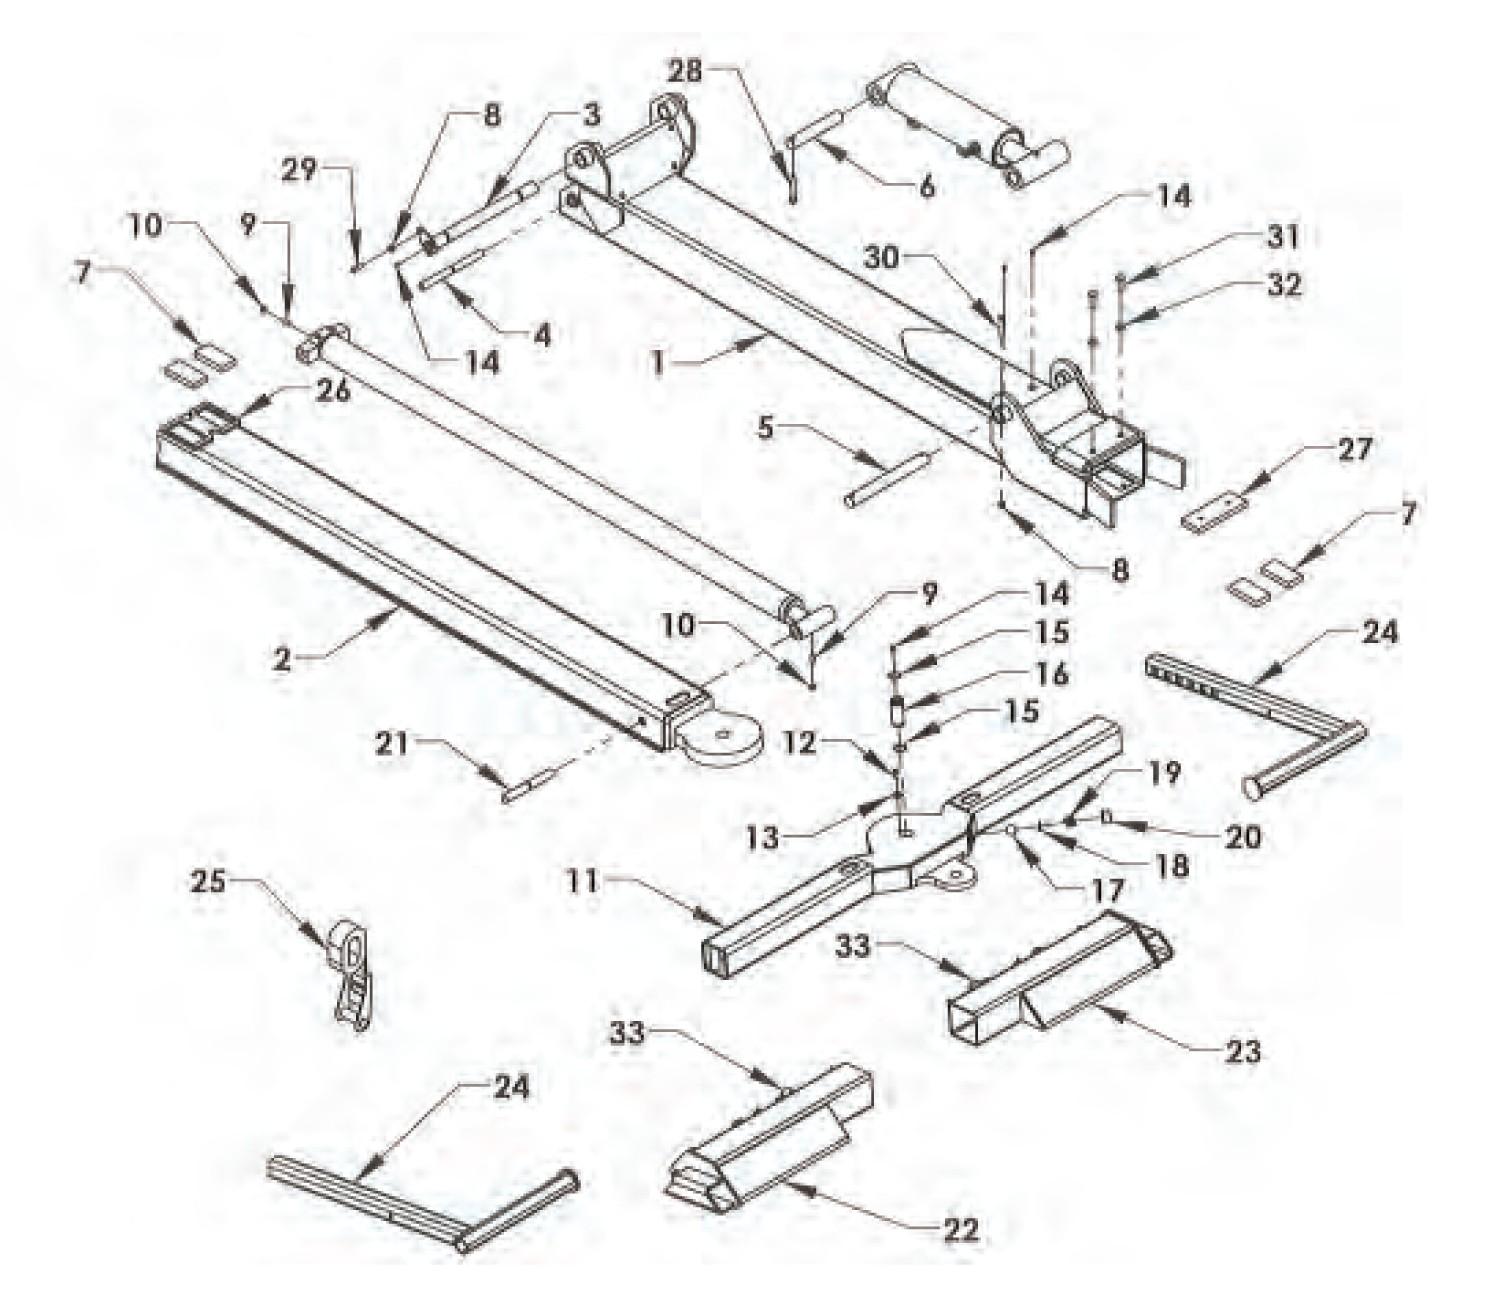 Car Wheel assembly Diagram Wheel Lift & Wheel Retainer assembly